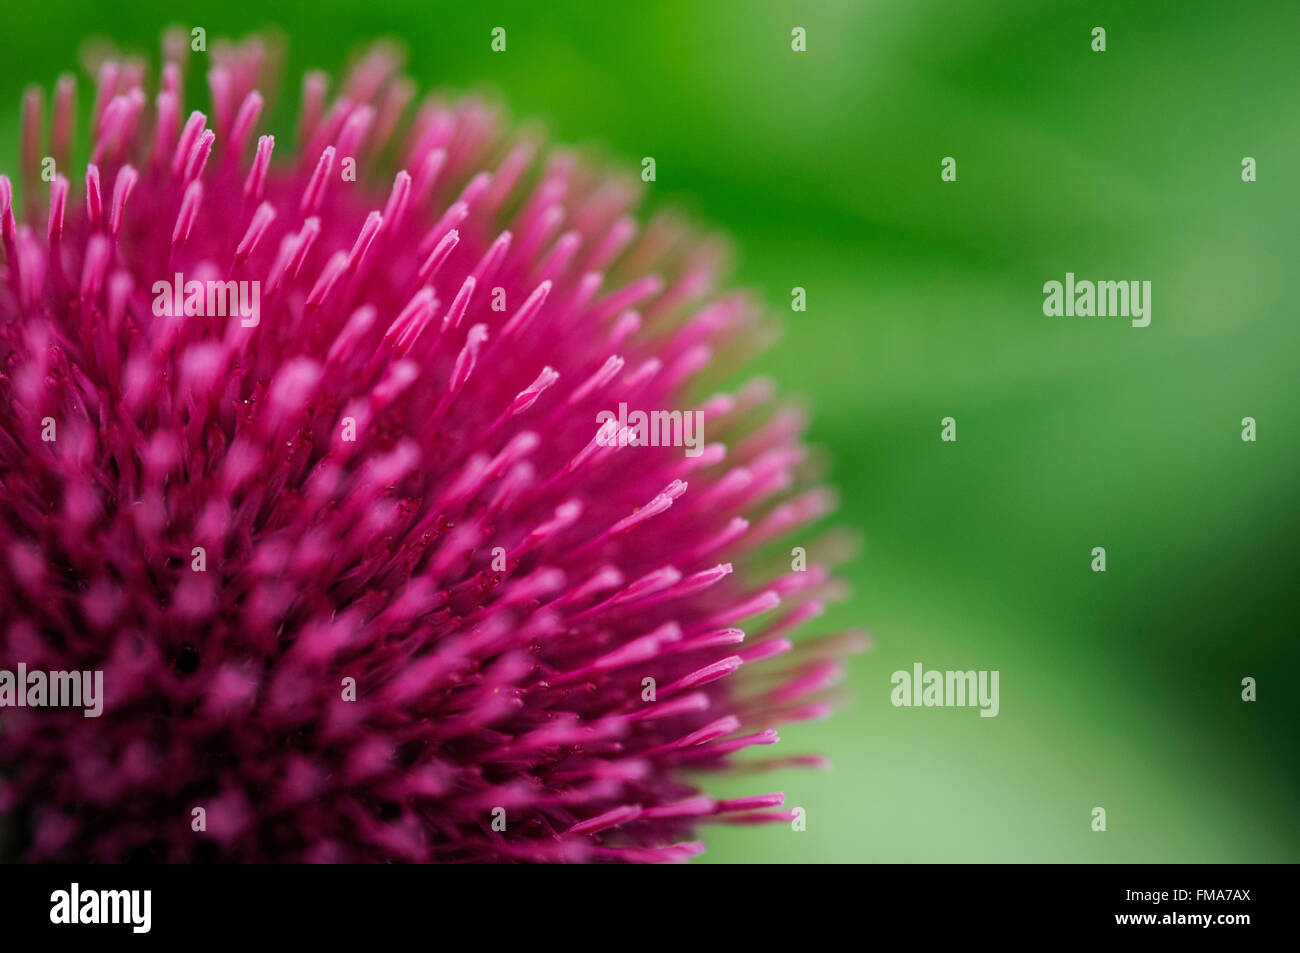 Close up of deep burgundy flowers of a Cirsium atropurpureum flowering in a summer garden. - Stock Image